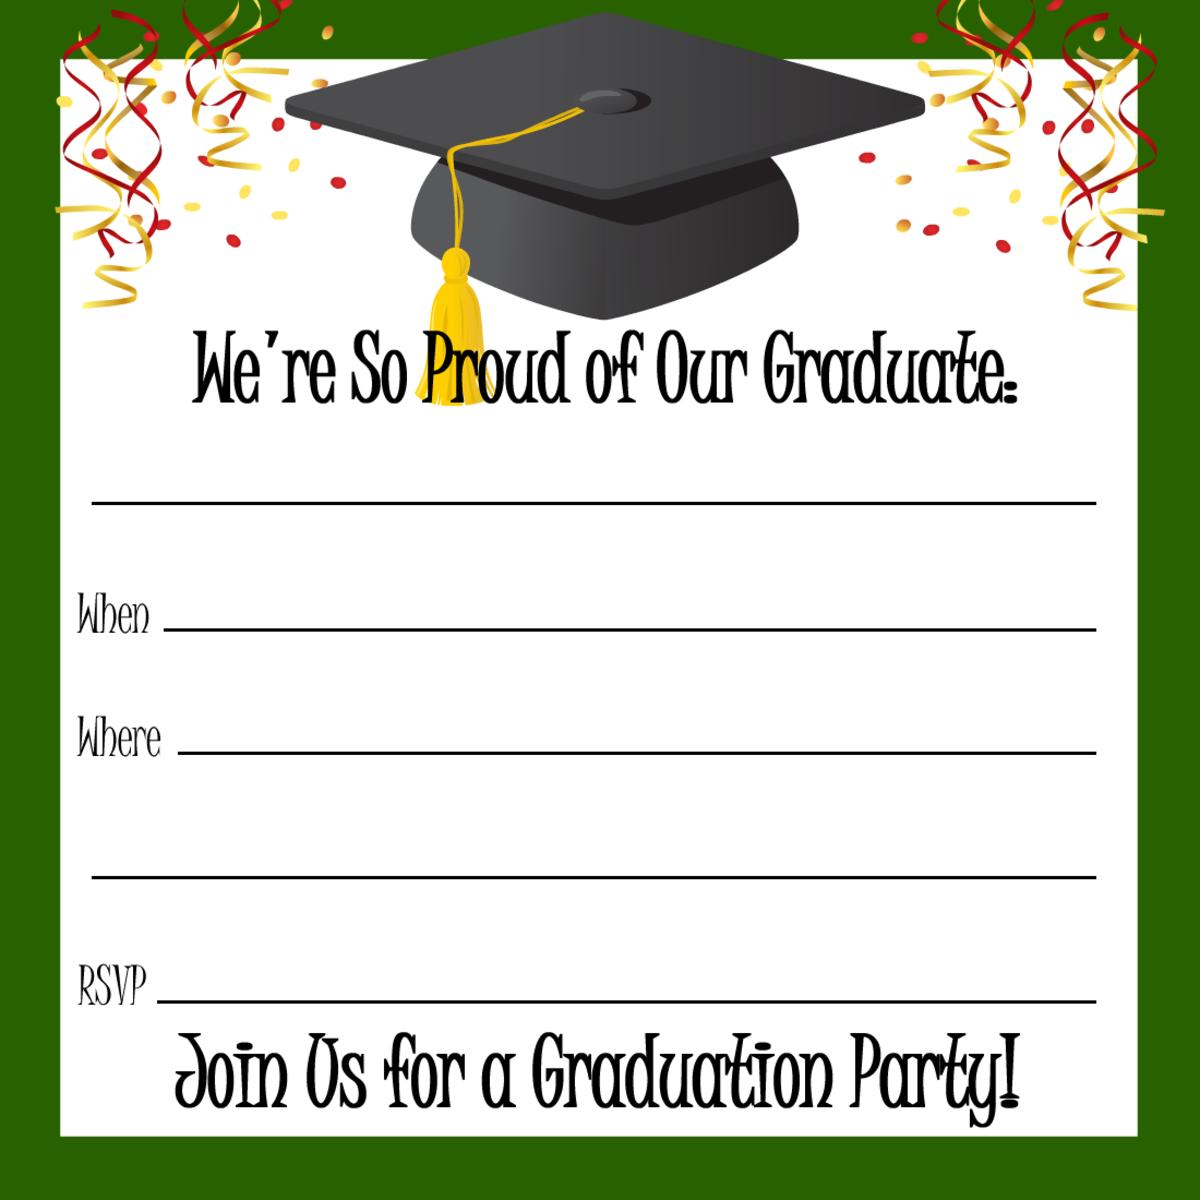 Green border, confetti, streamers and graduation hat